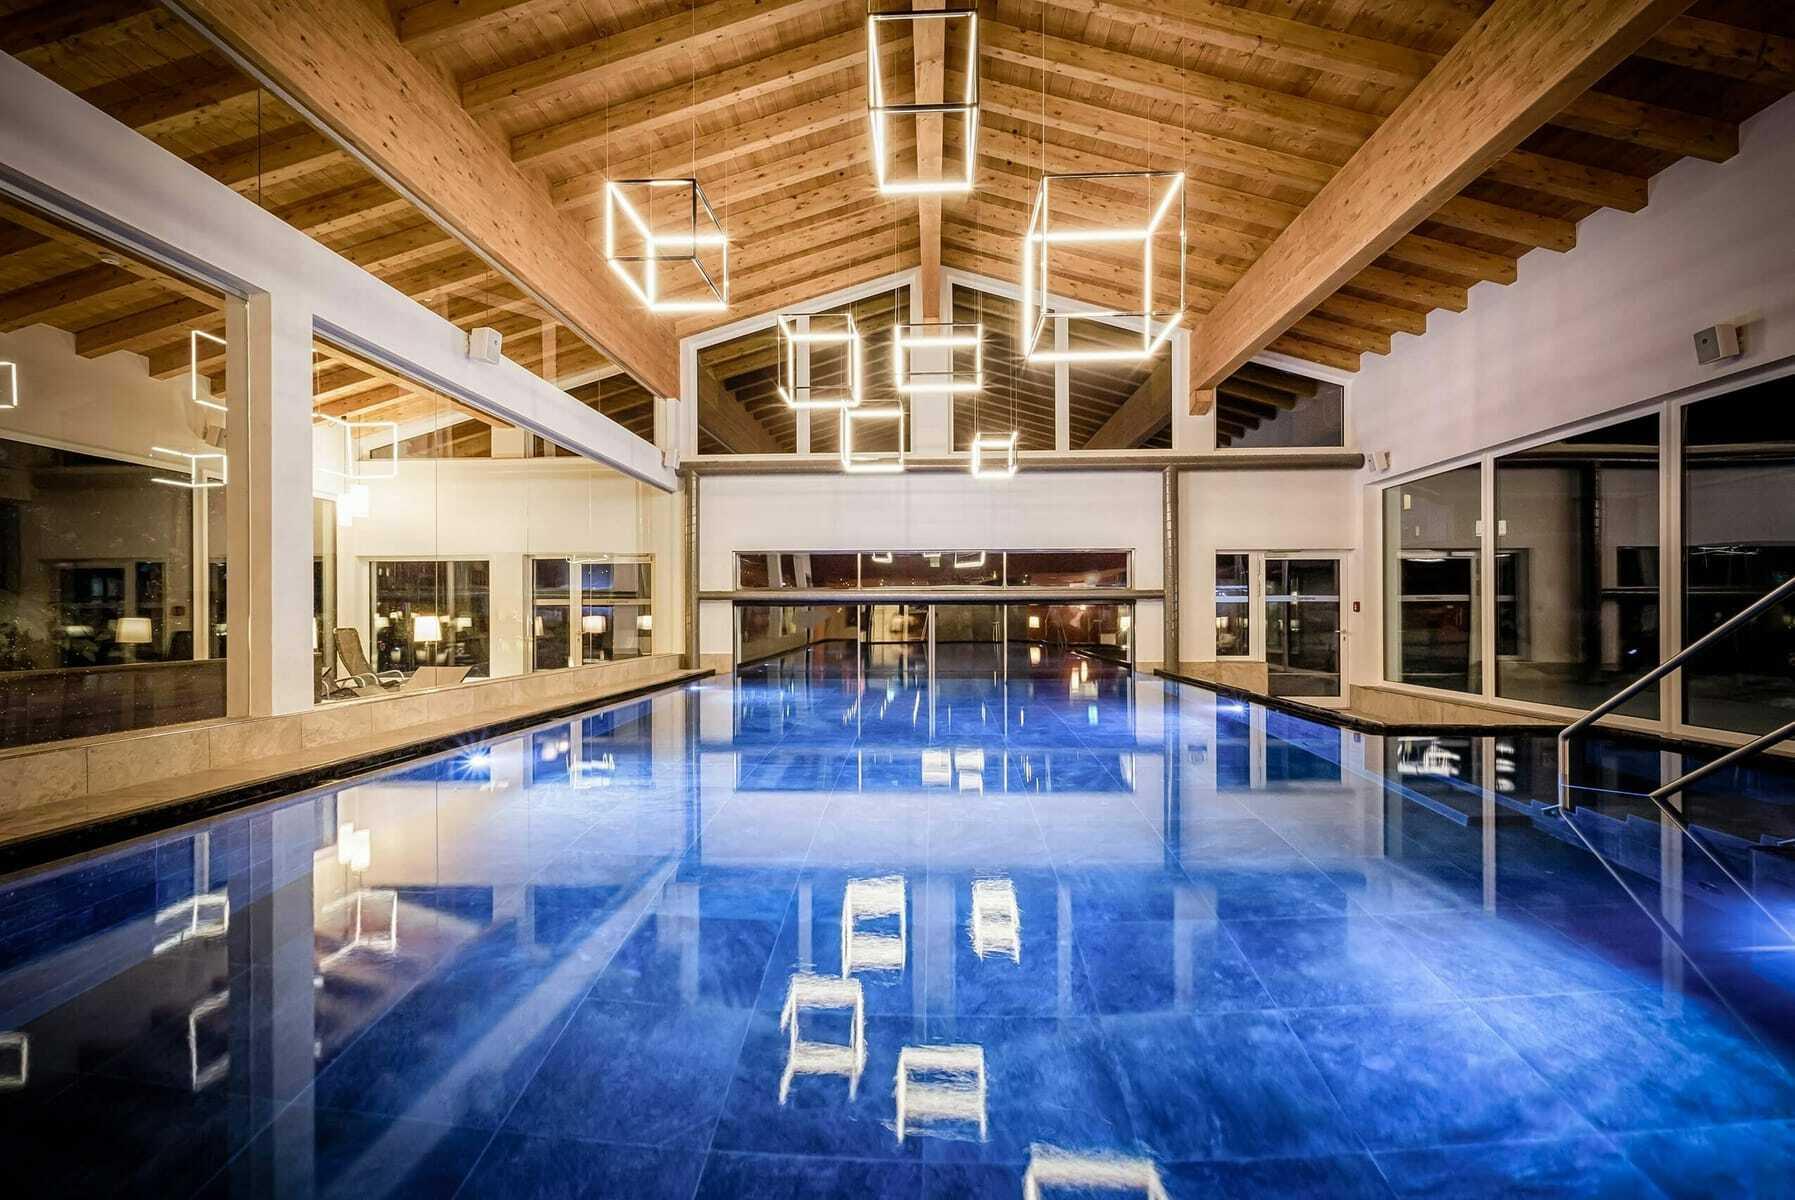 IndoorPool_Das_Walchsee_Sportresort_Walchsee